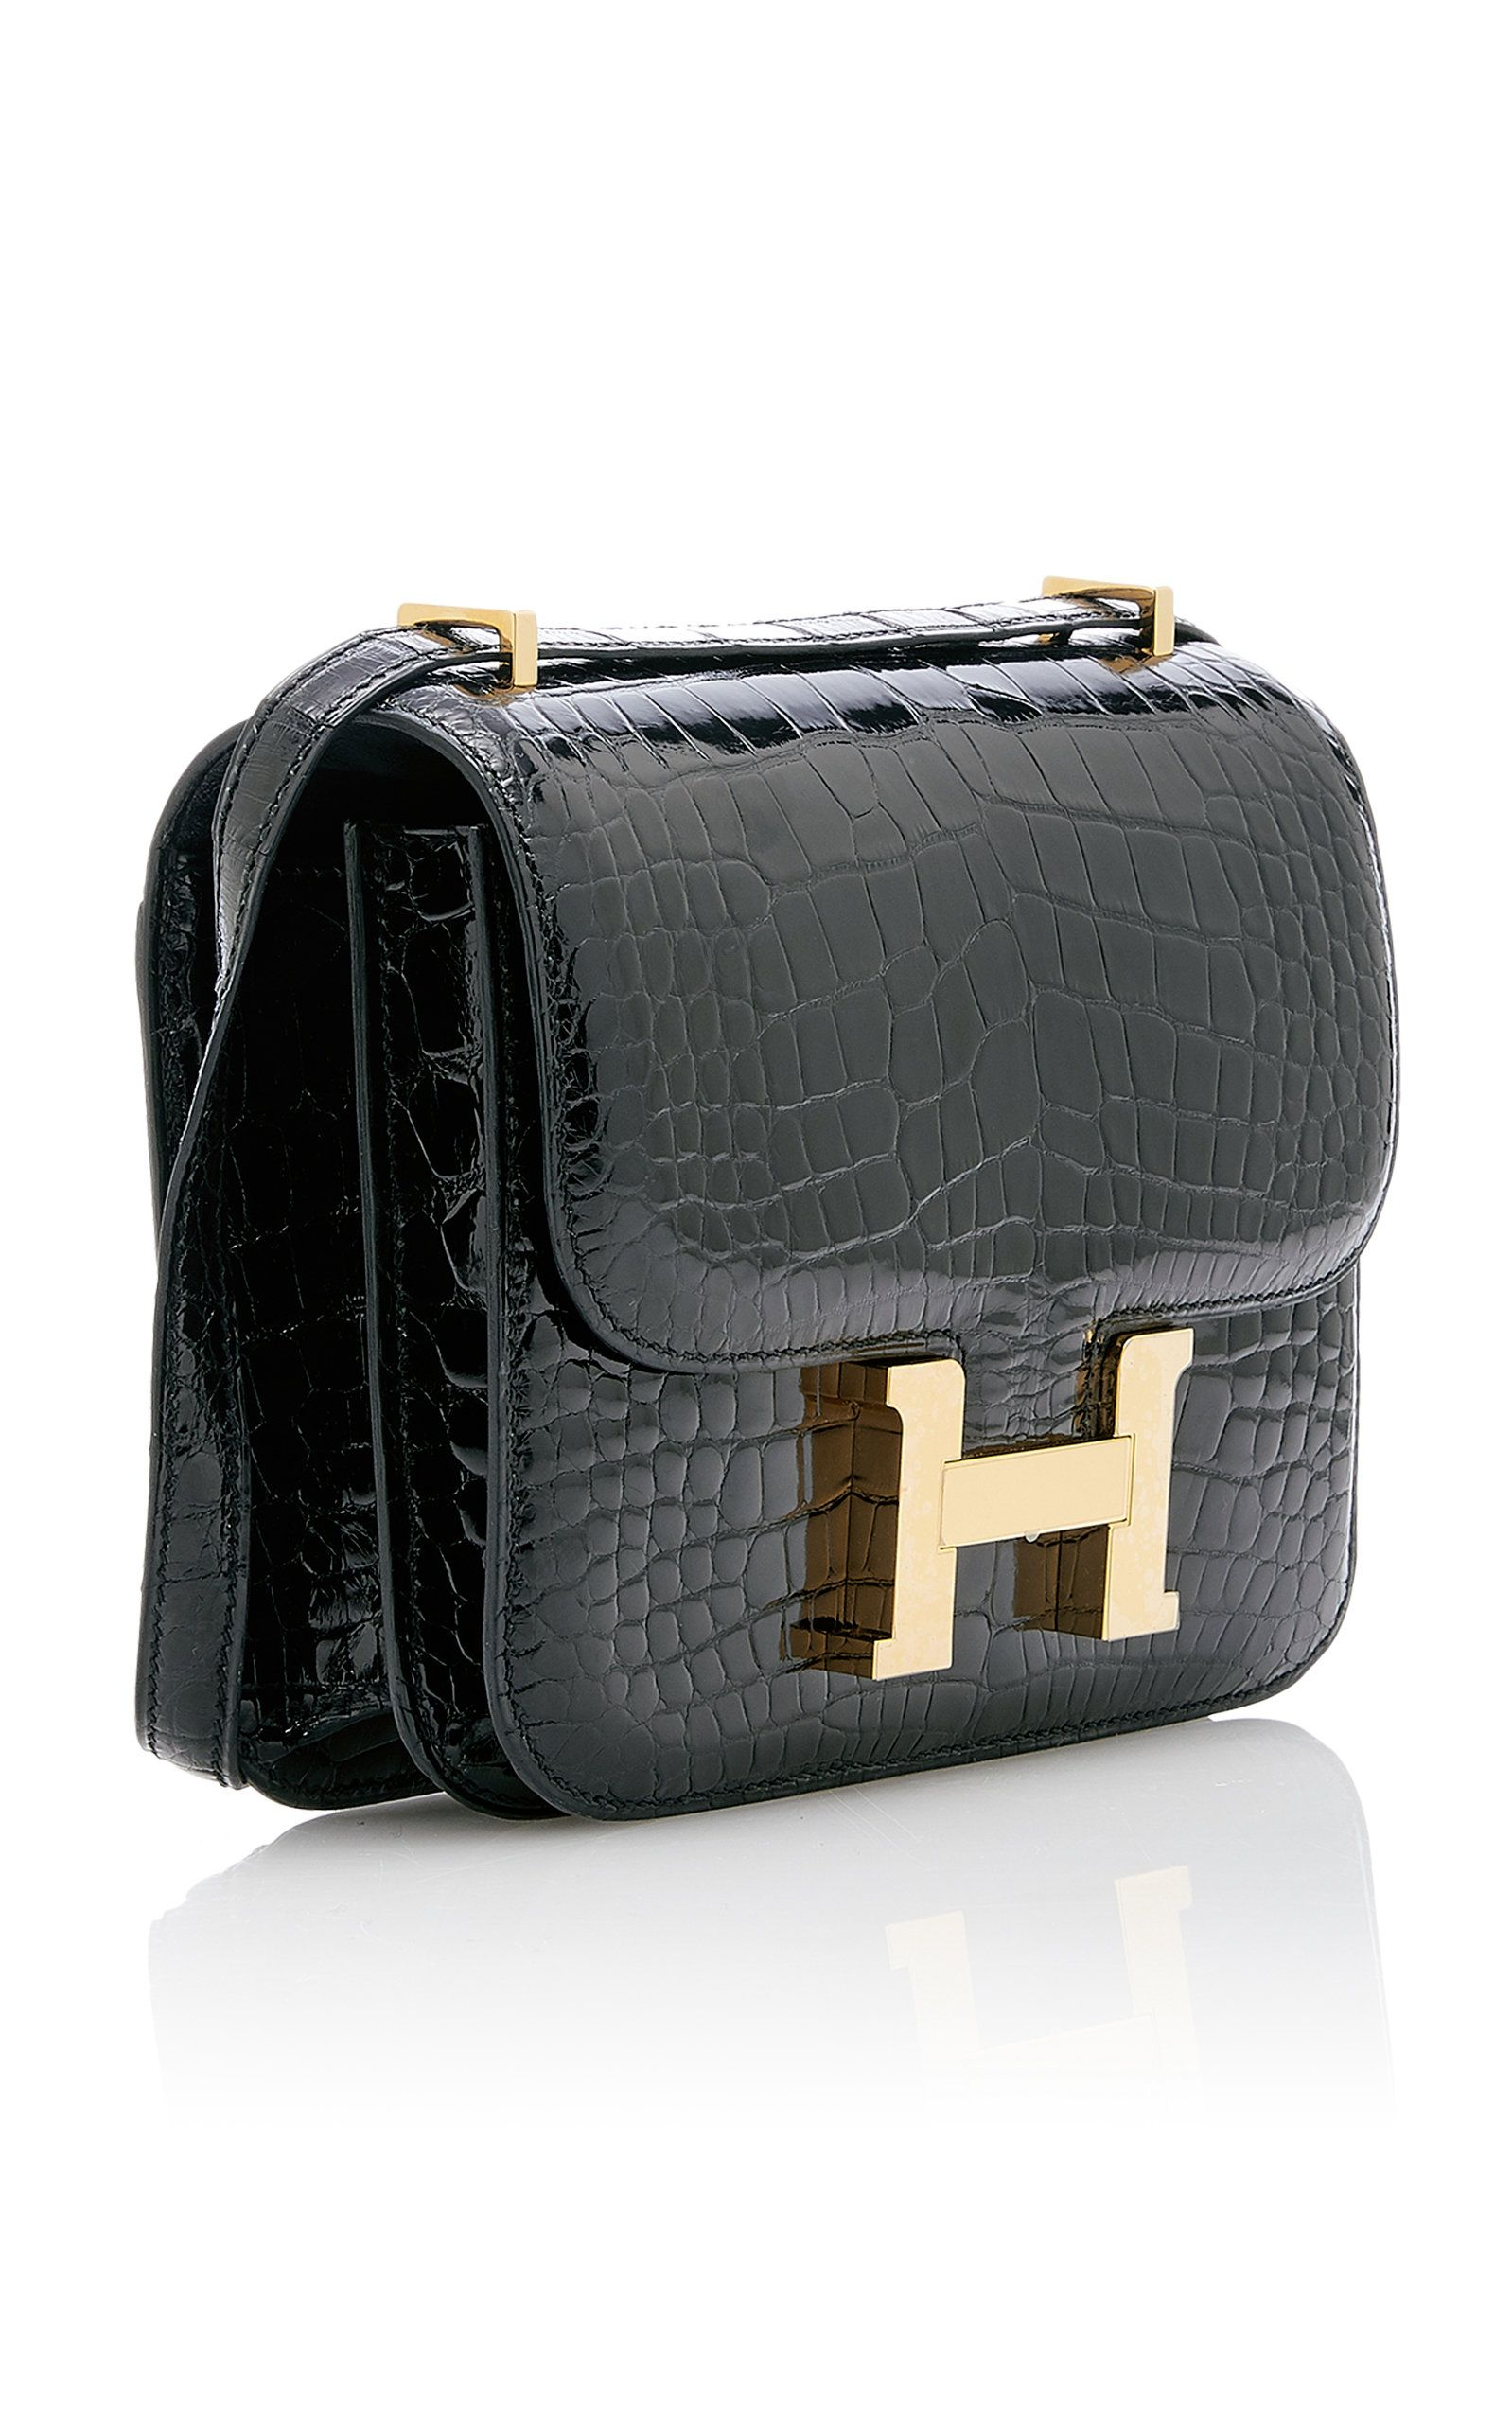 be92b27aa2 Hermès 18cm Shiny Black Crocodile Constance by HERMÈS VINTAGE BY HERITAGE  AUCTIONS for Preorder on Moda Operandi